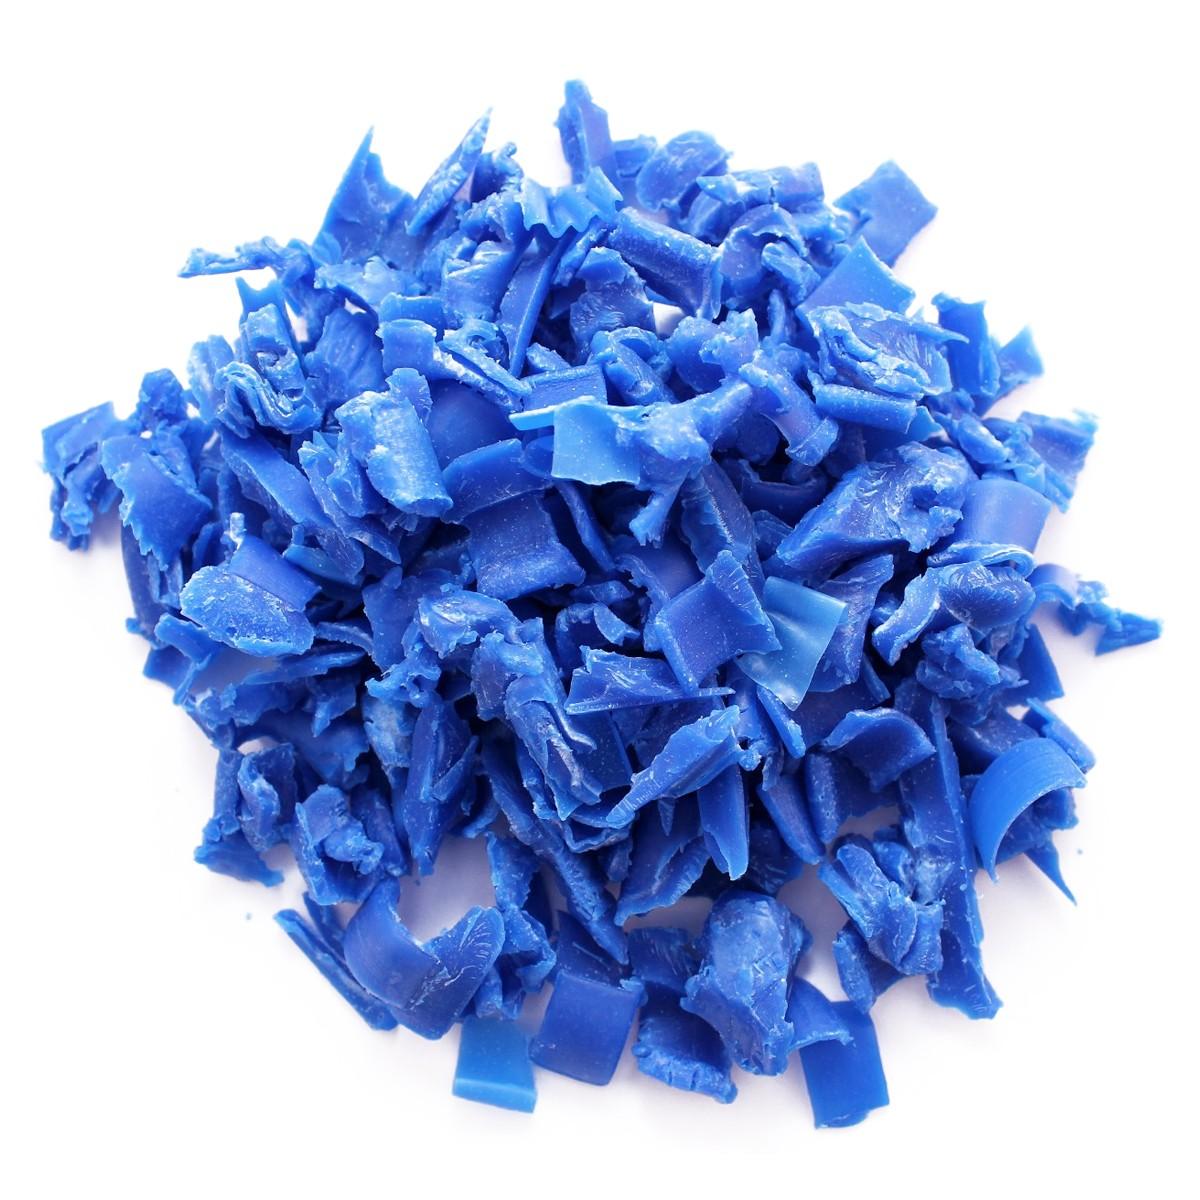 Castaldo Blue Plast-O-Wax - 4.4 lbs ( 2kg)  Bag